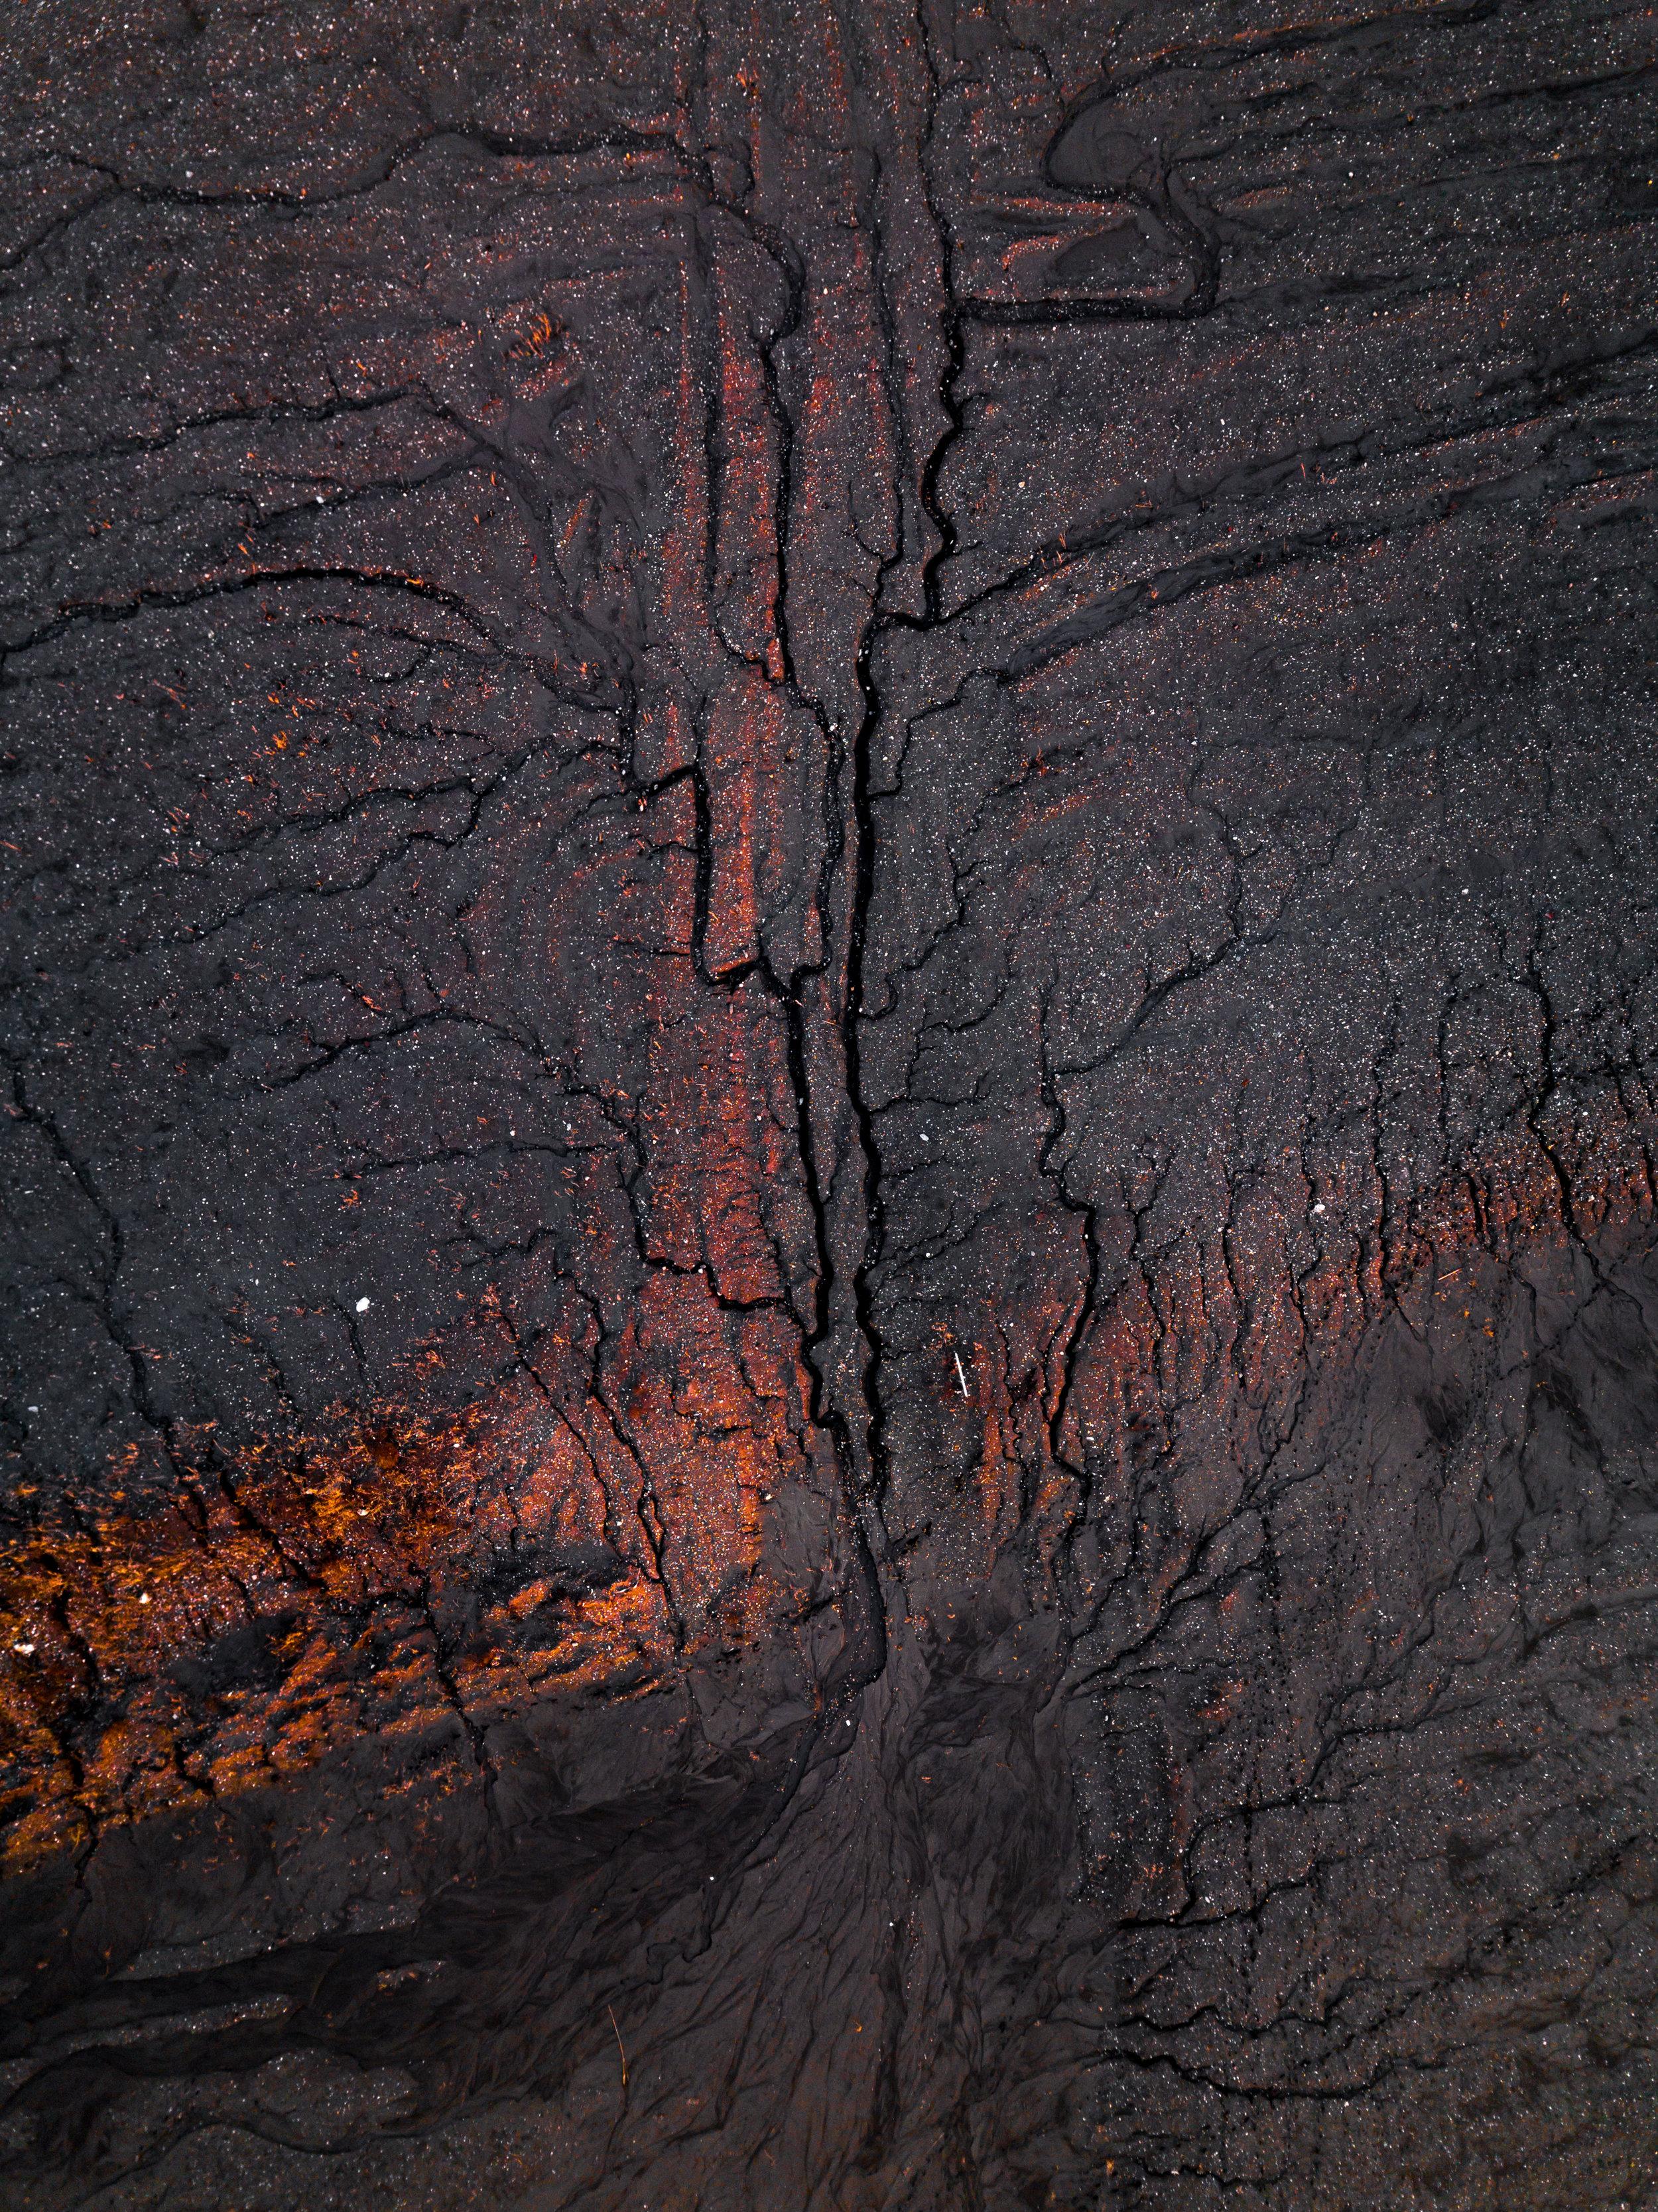 lavarock_typoland_aerial.jpg